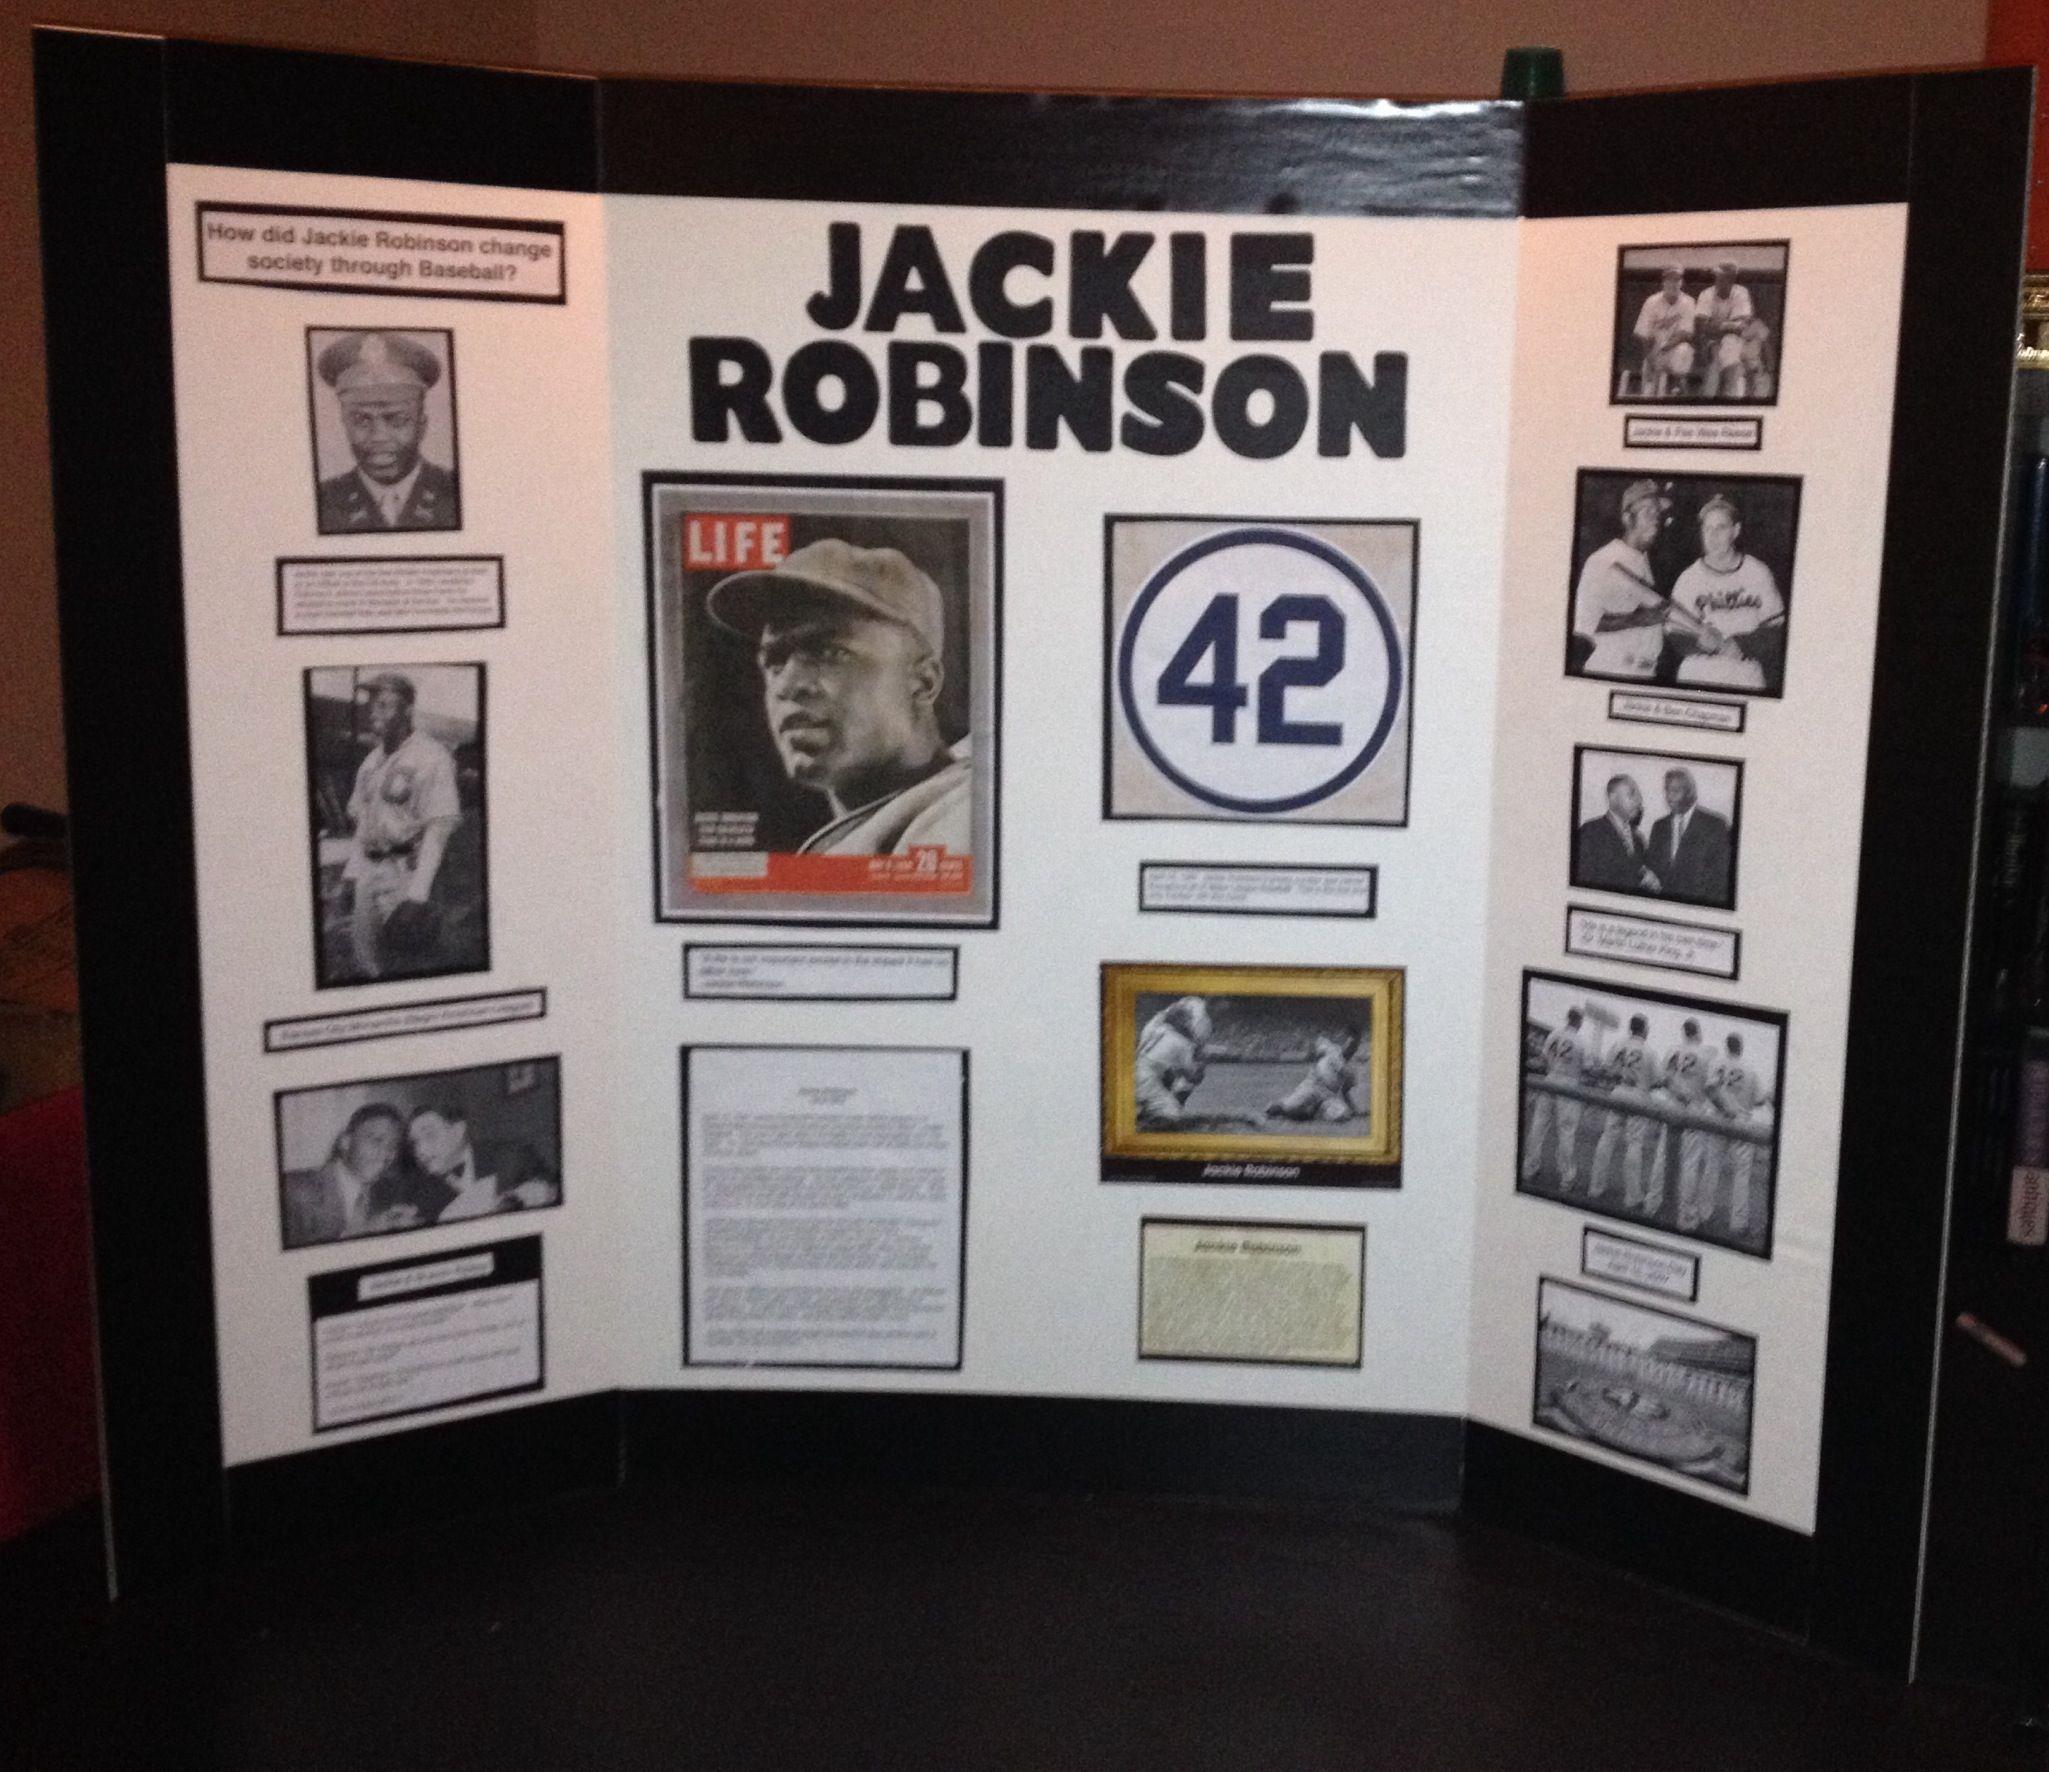 Daughters Social Stu S Board She Chose Jackie Robinson